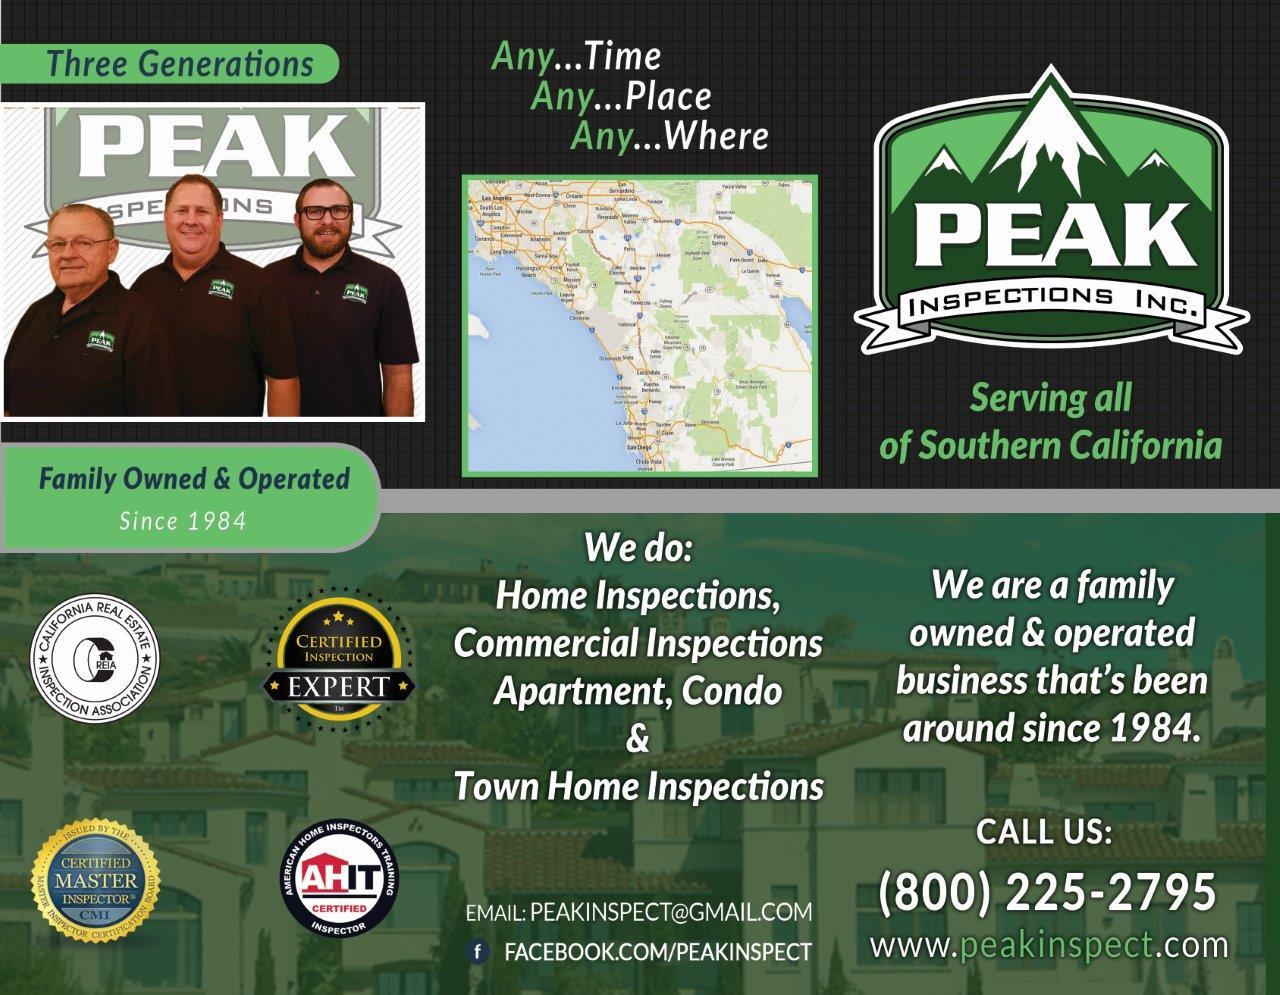 Peak Inspections Inc. image 1